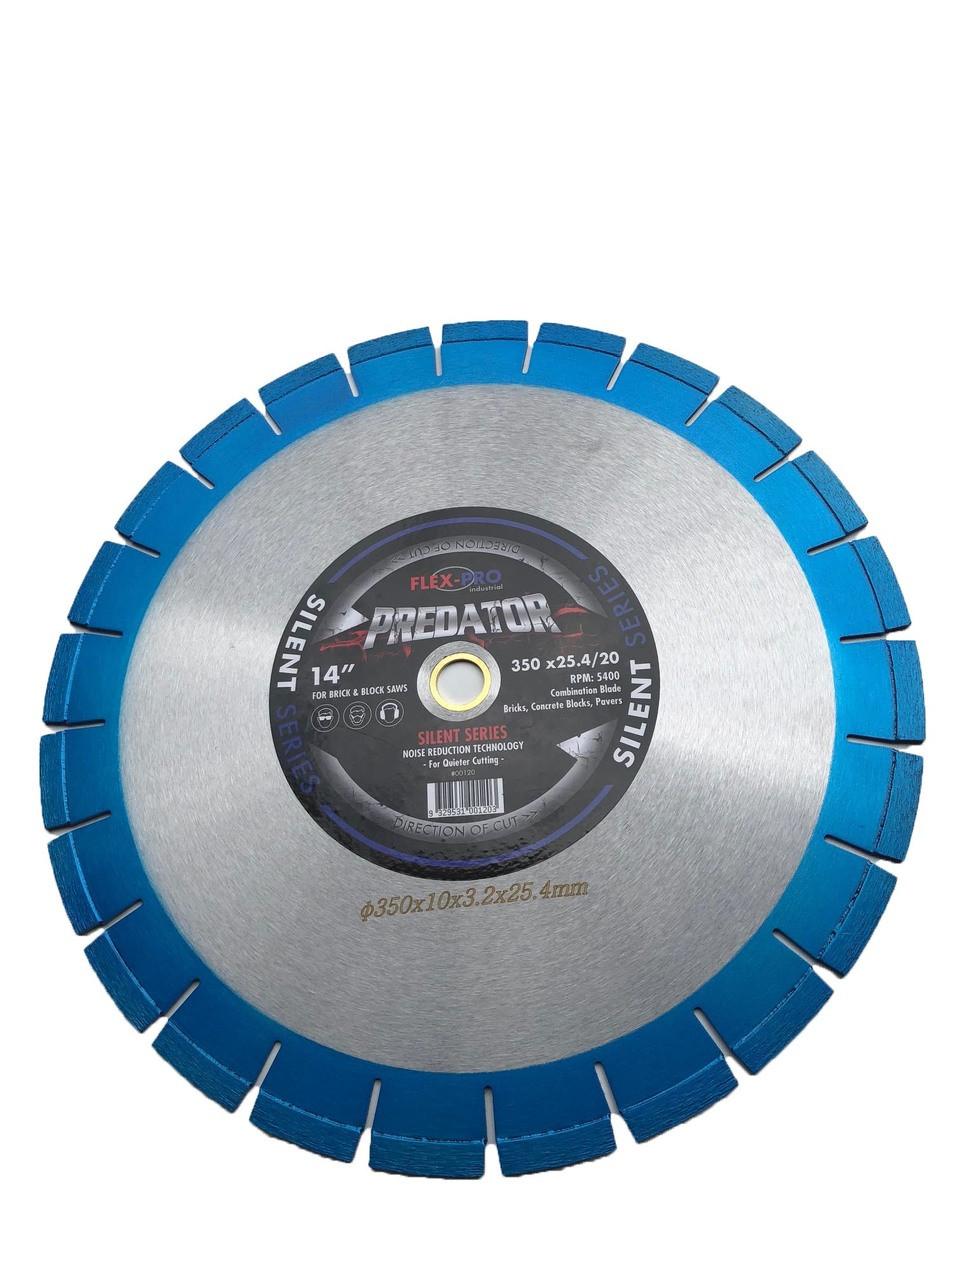 "Diamond saw blade 14"" Laser welded Reduced Noise SILENT FLEX PRO"